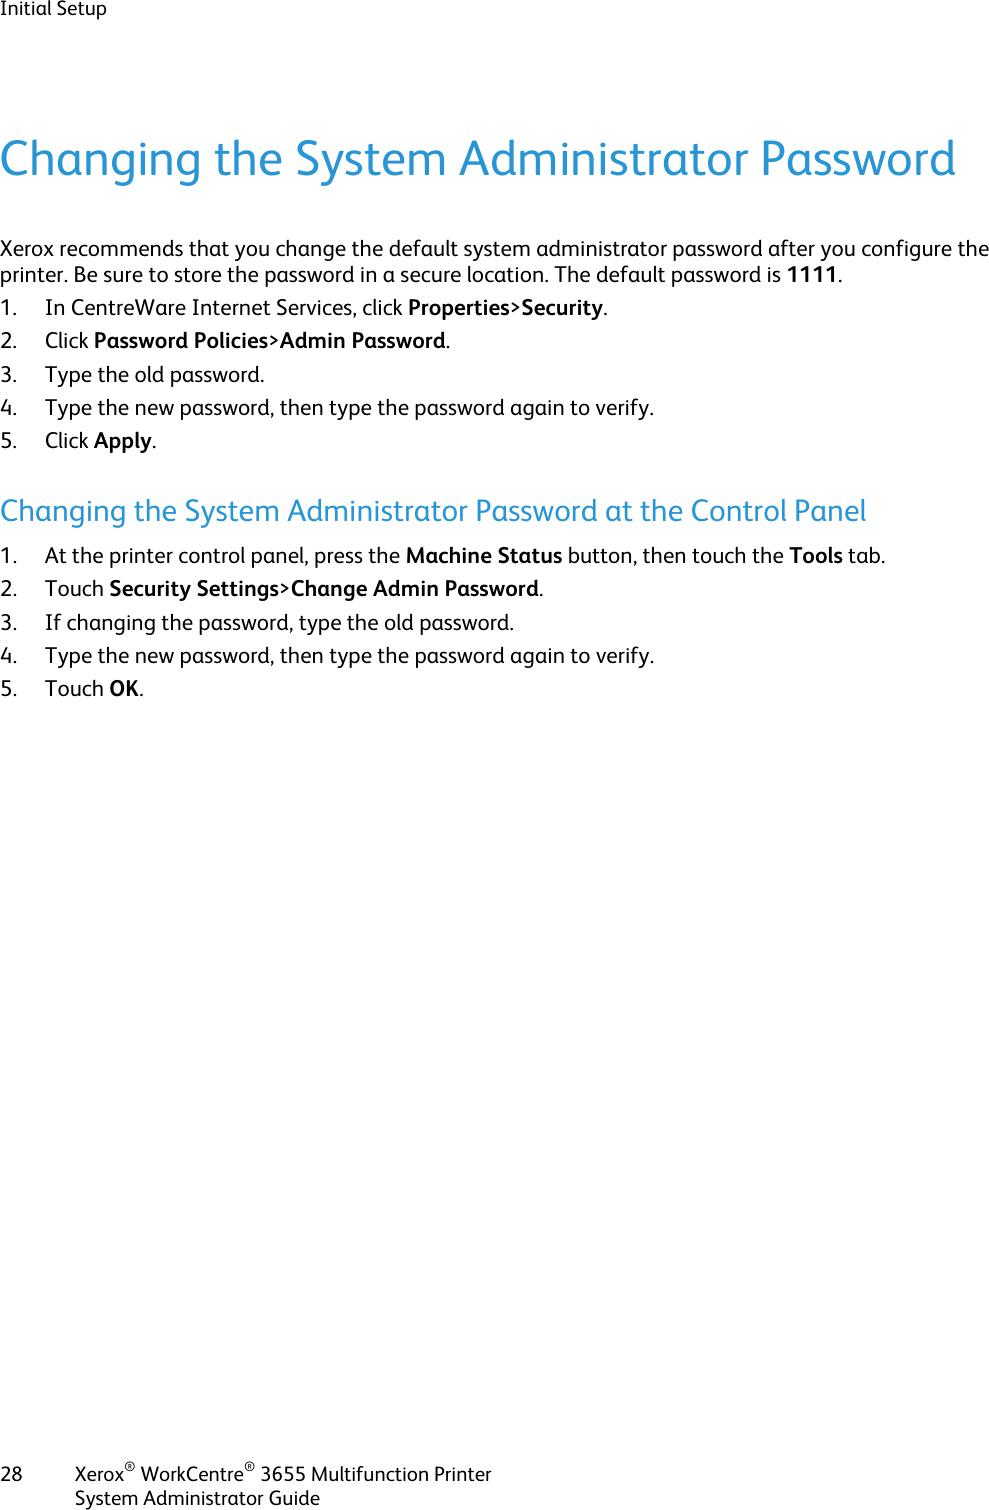 Xerox Workcentre 3655 Administrators Guide Xerox® WorkCentre